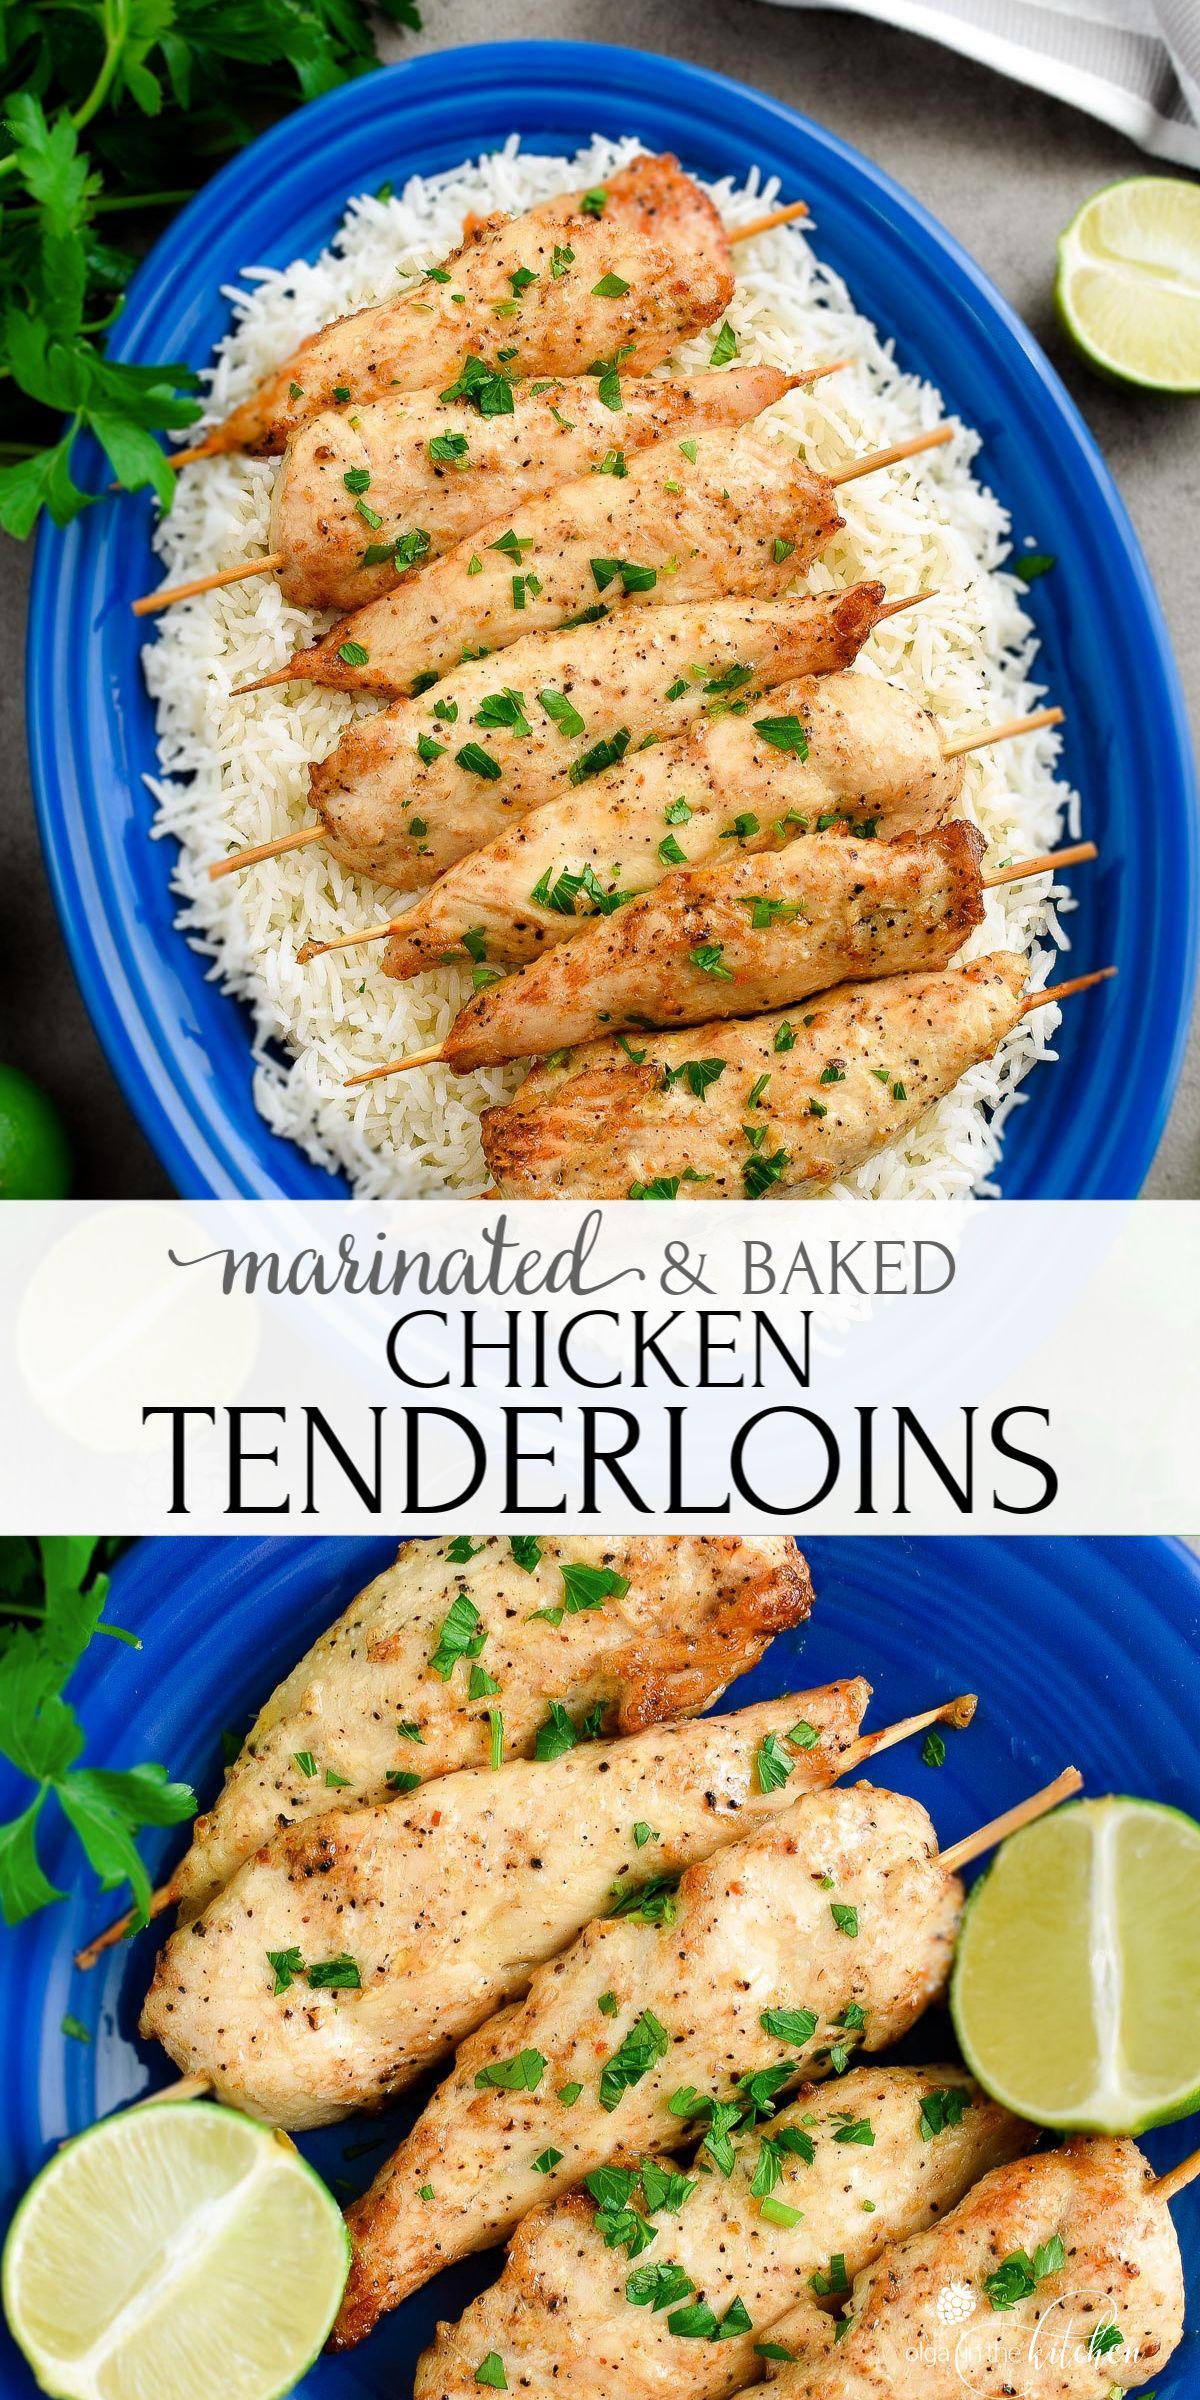 Marinated Baked Chicken Tenderloins Video Olga In The Kitchen Recipe In 2020 Baked Chicken Tenderloins Chicken Tenderloin Recipes Chicken Tenderloins